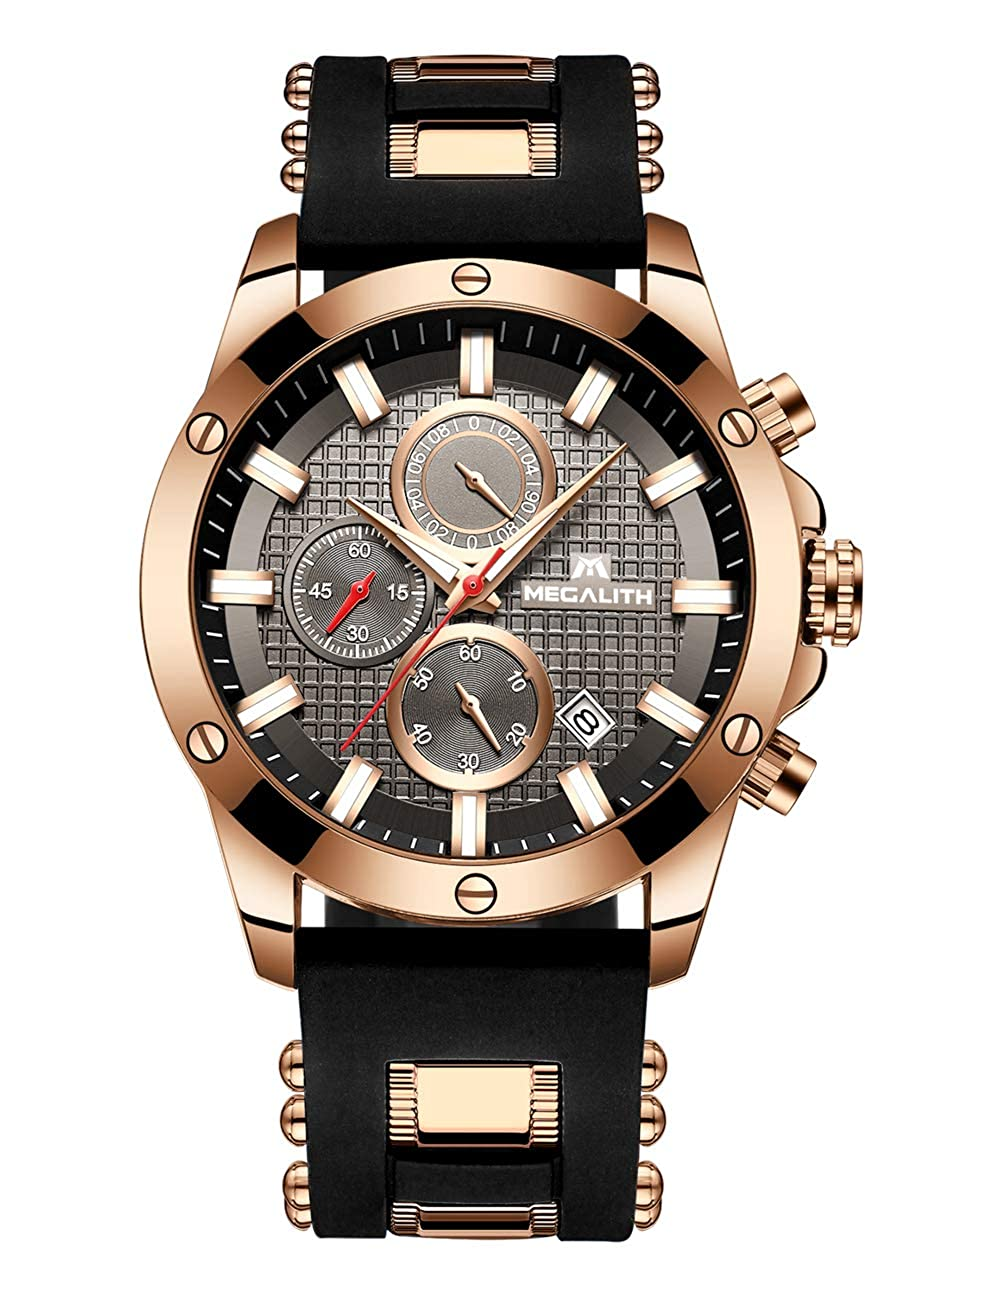 9552342027d Mens Watches Men Chronograph Waterproof Sports Designer Rose Gold Large  Face Luminous Date Wrist Watch Luxury Fashion Rubber Analogue Quartz Watches  for Man